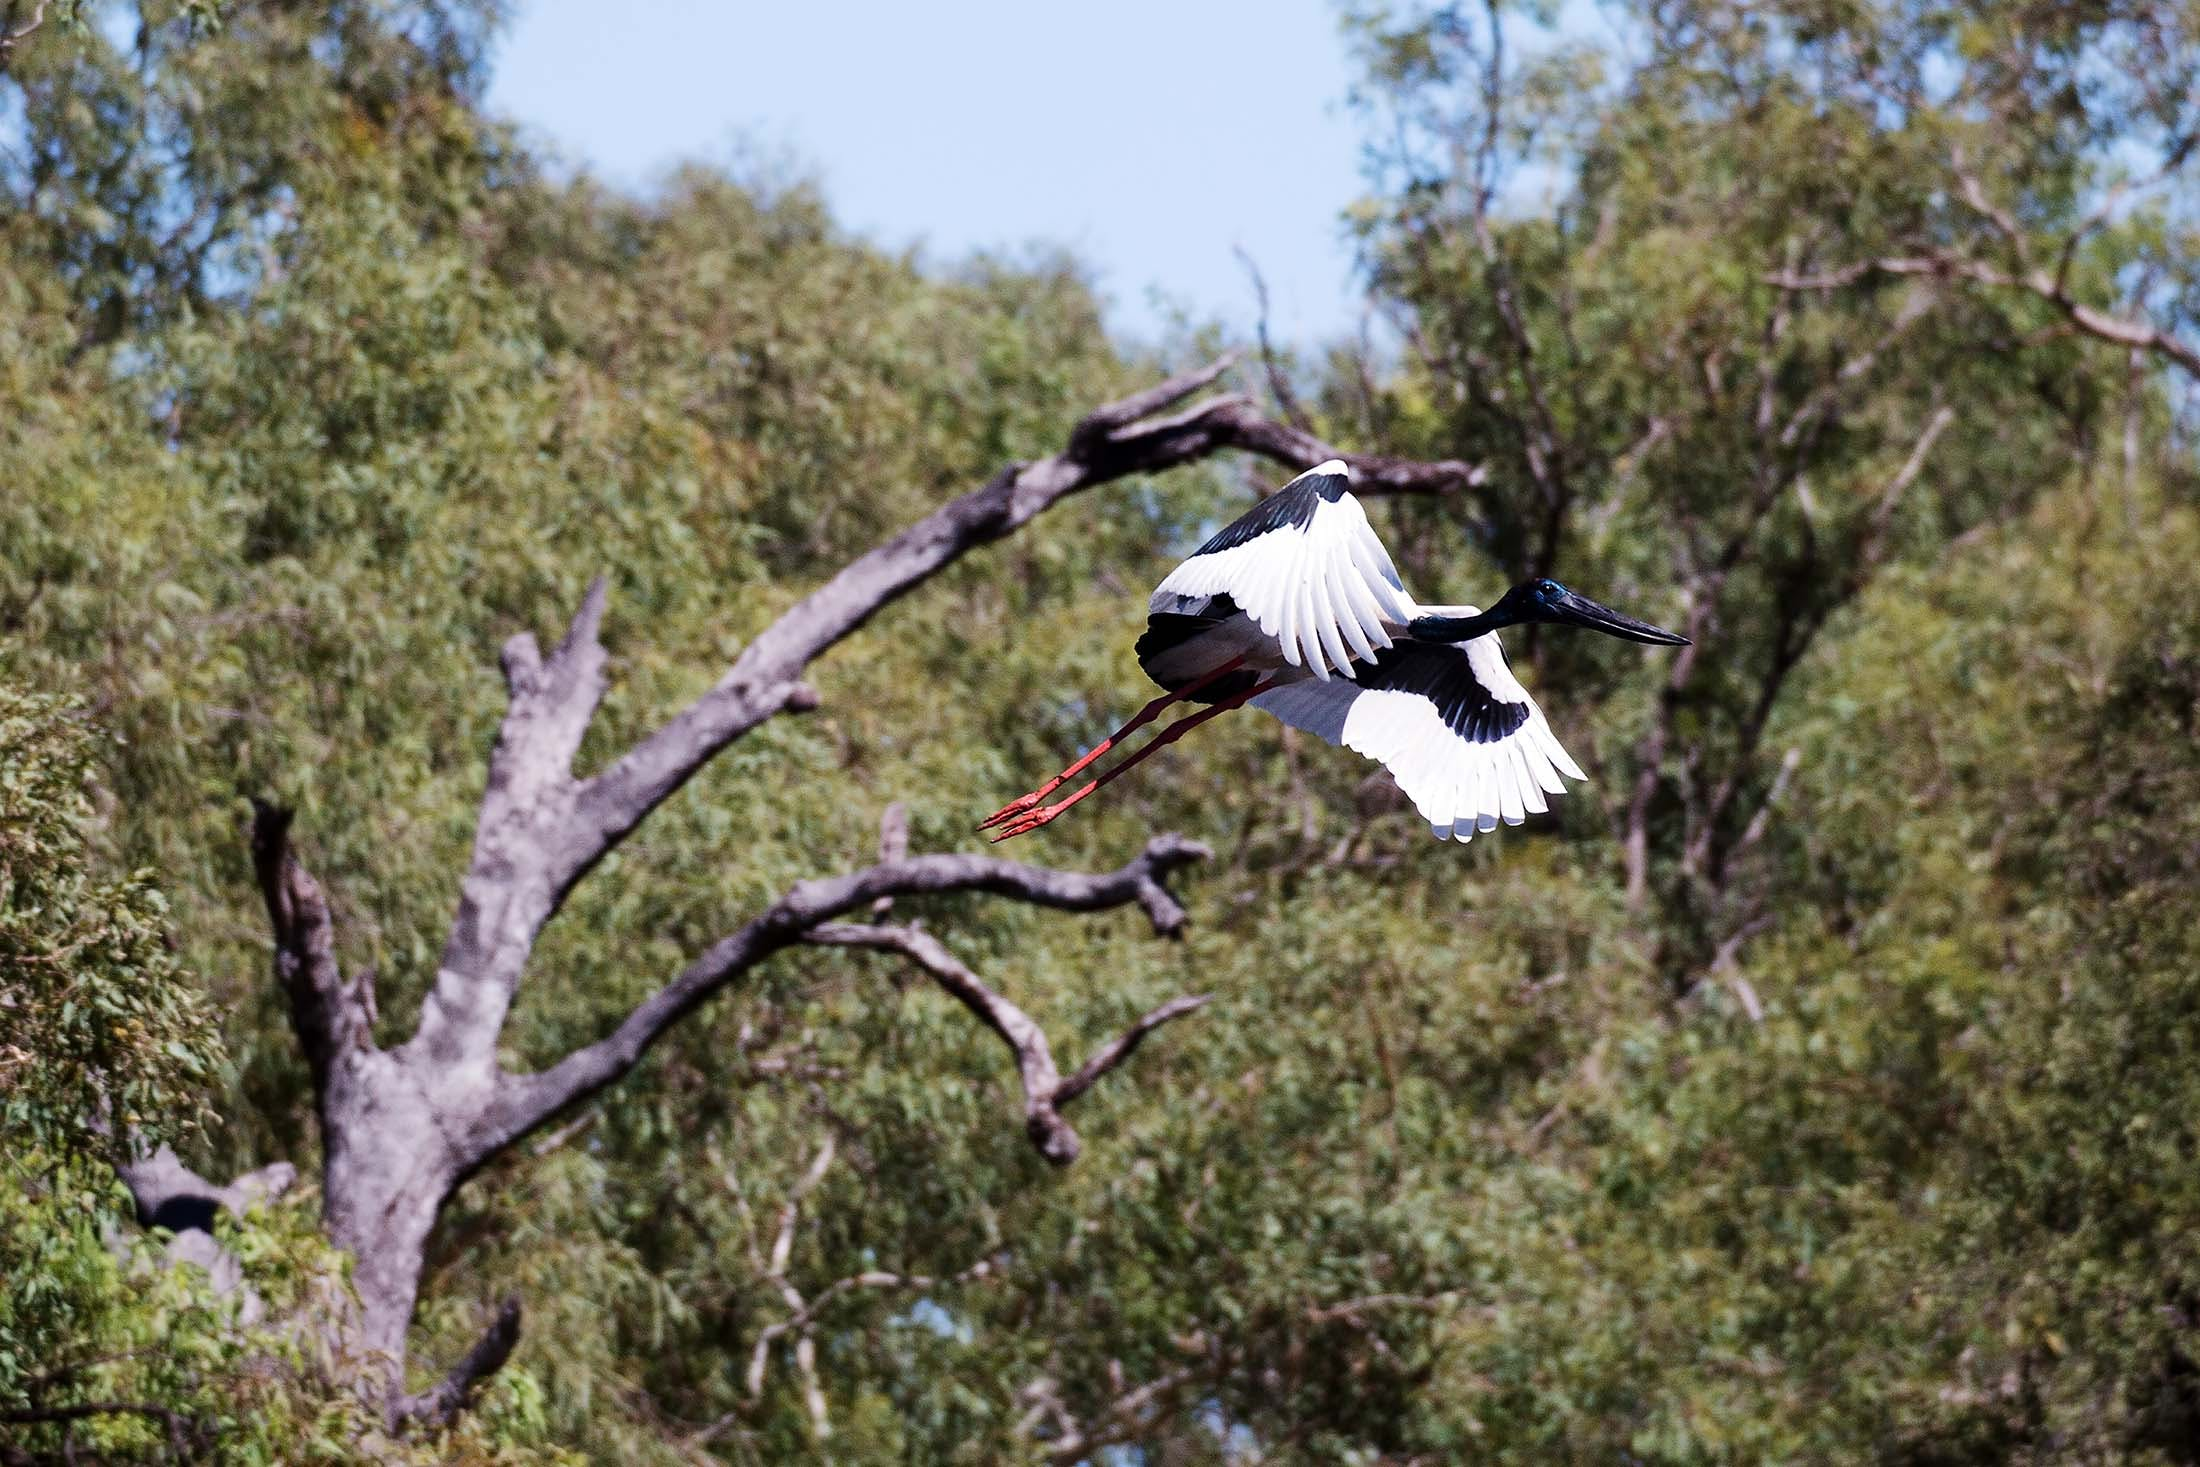 Jabiru bird by Ord River, Kimberley, Australia